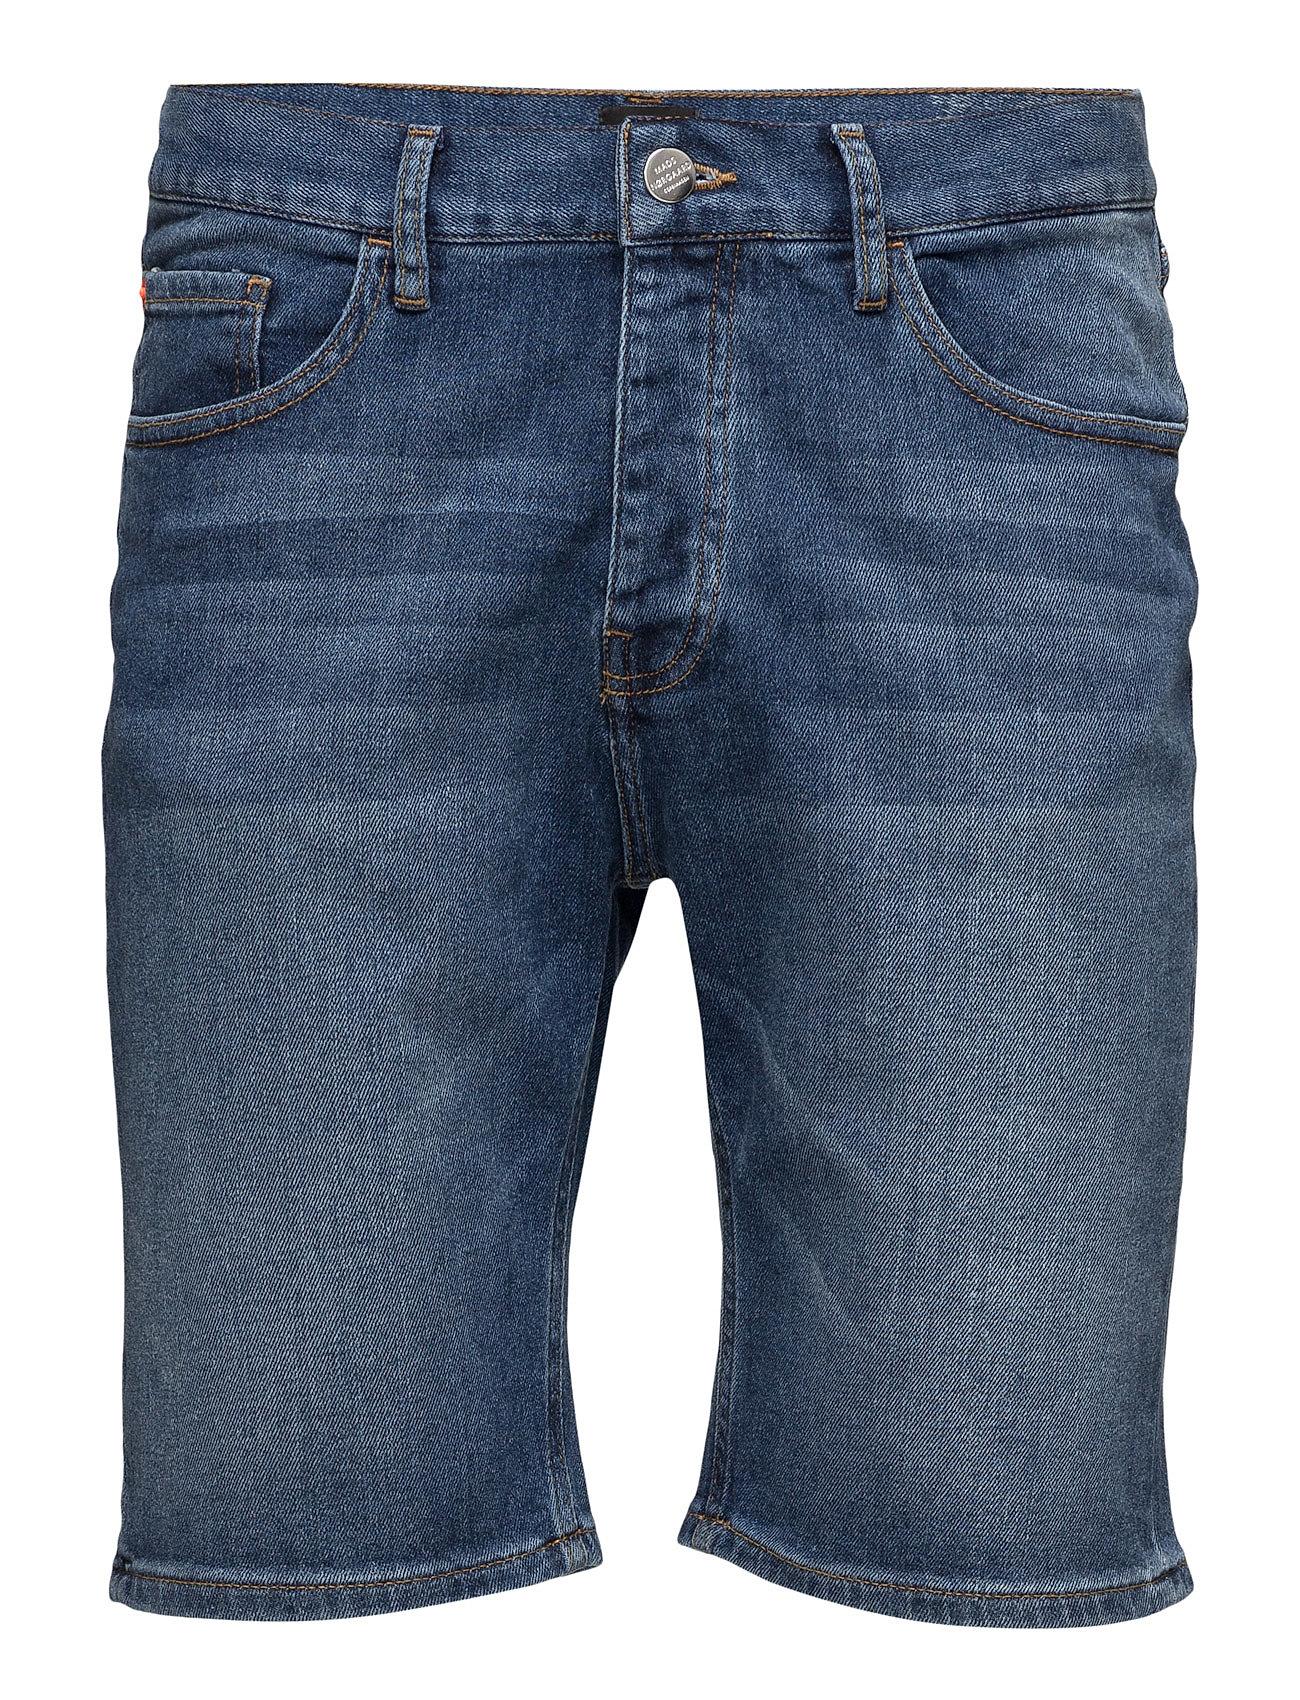 mads nã¸rgaard Denim shorts stone 17-1 fra boozt.com dk